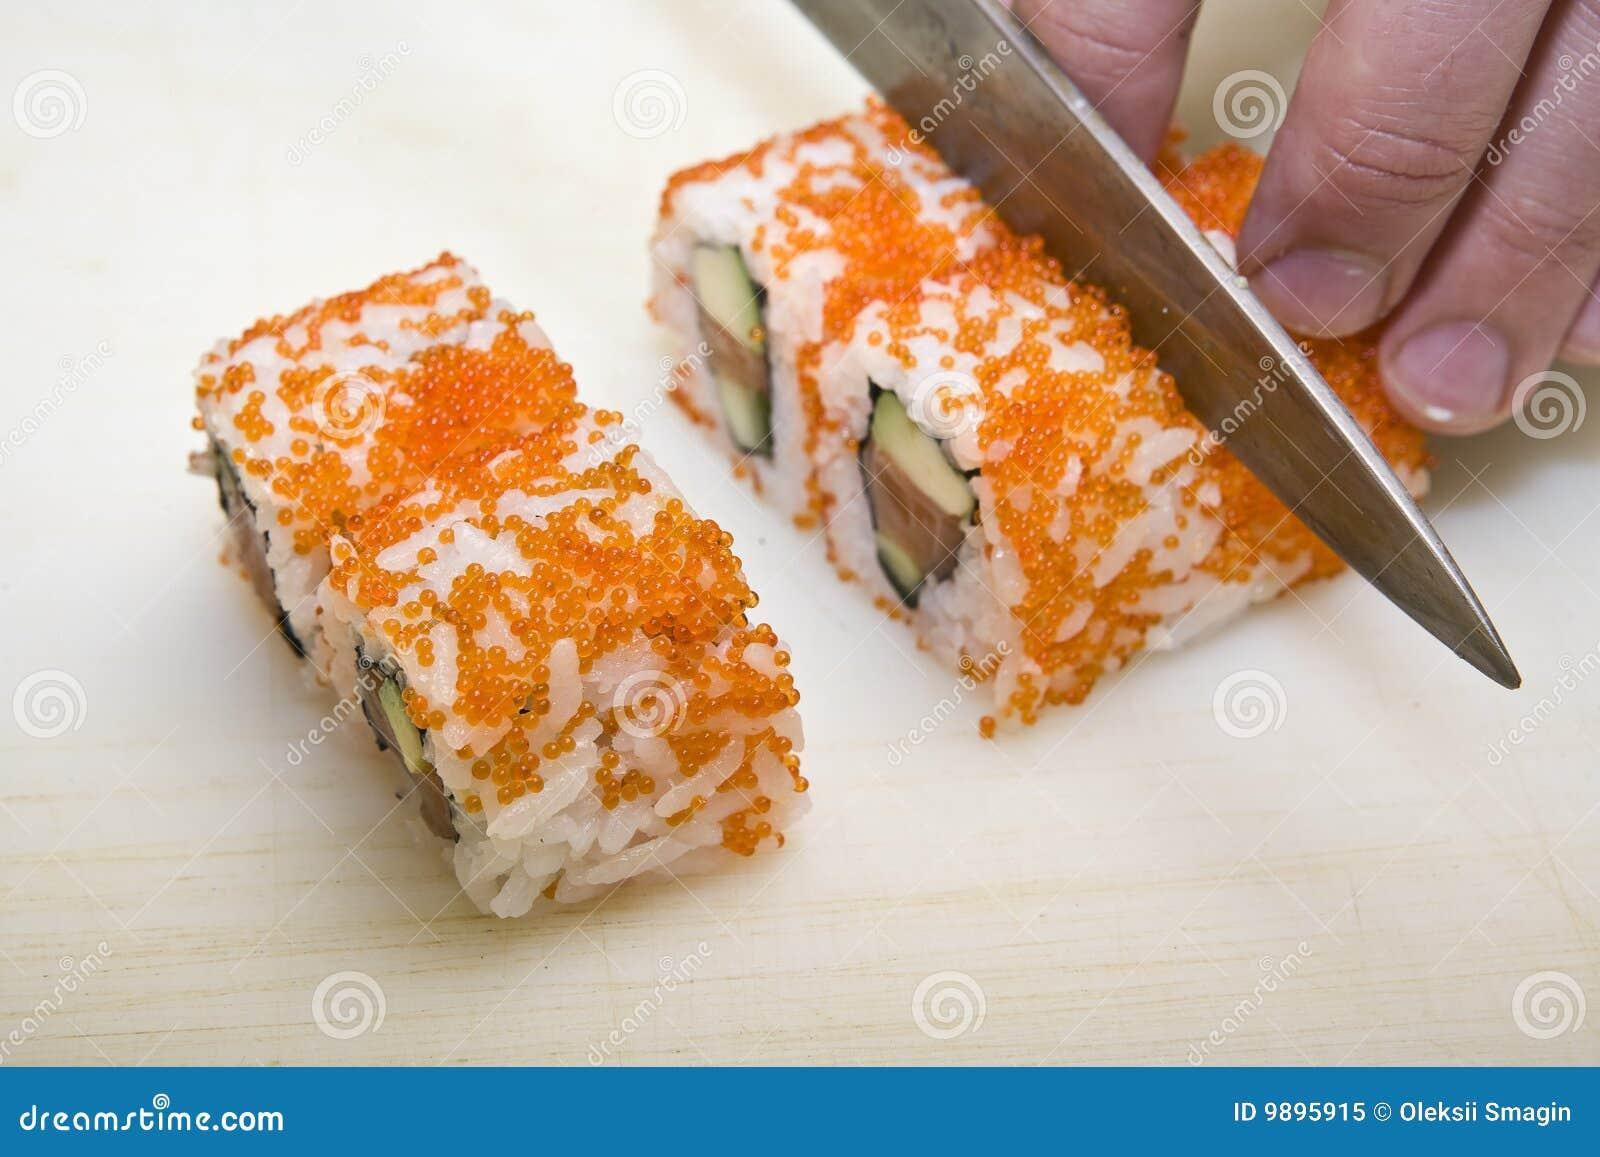 Cook on kitchen prepares Japanese susi